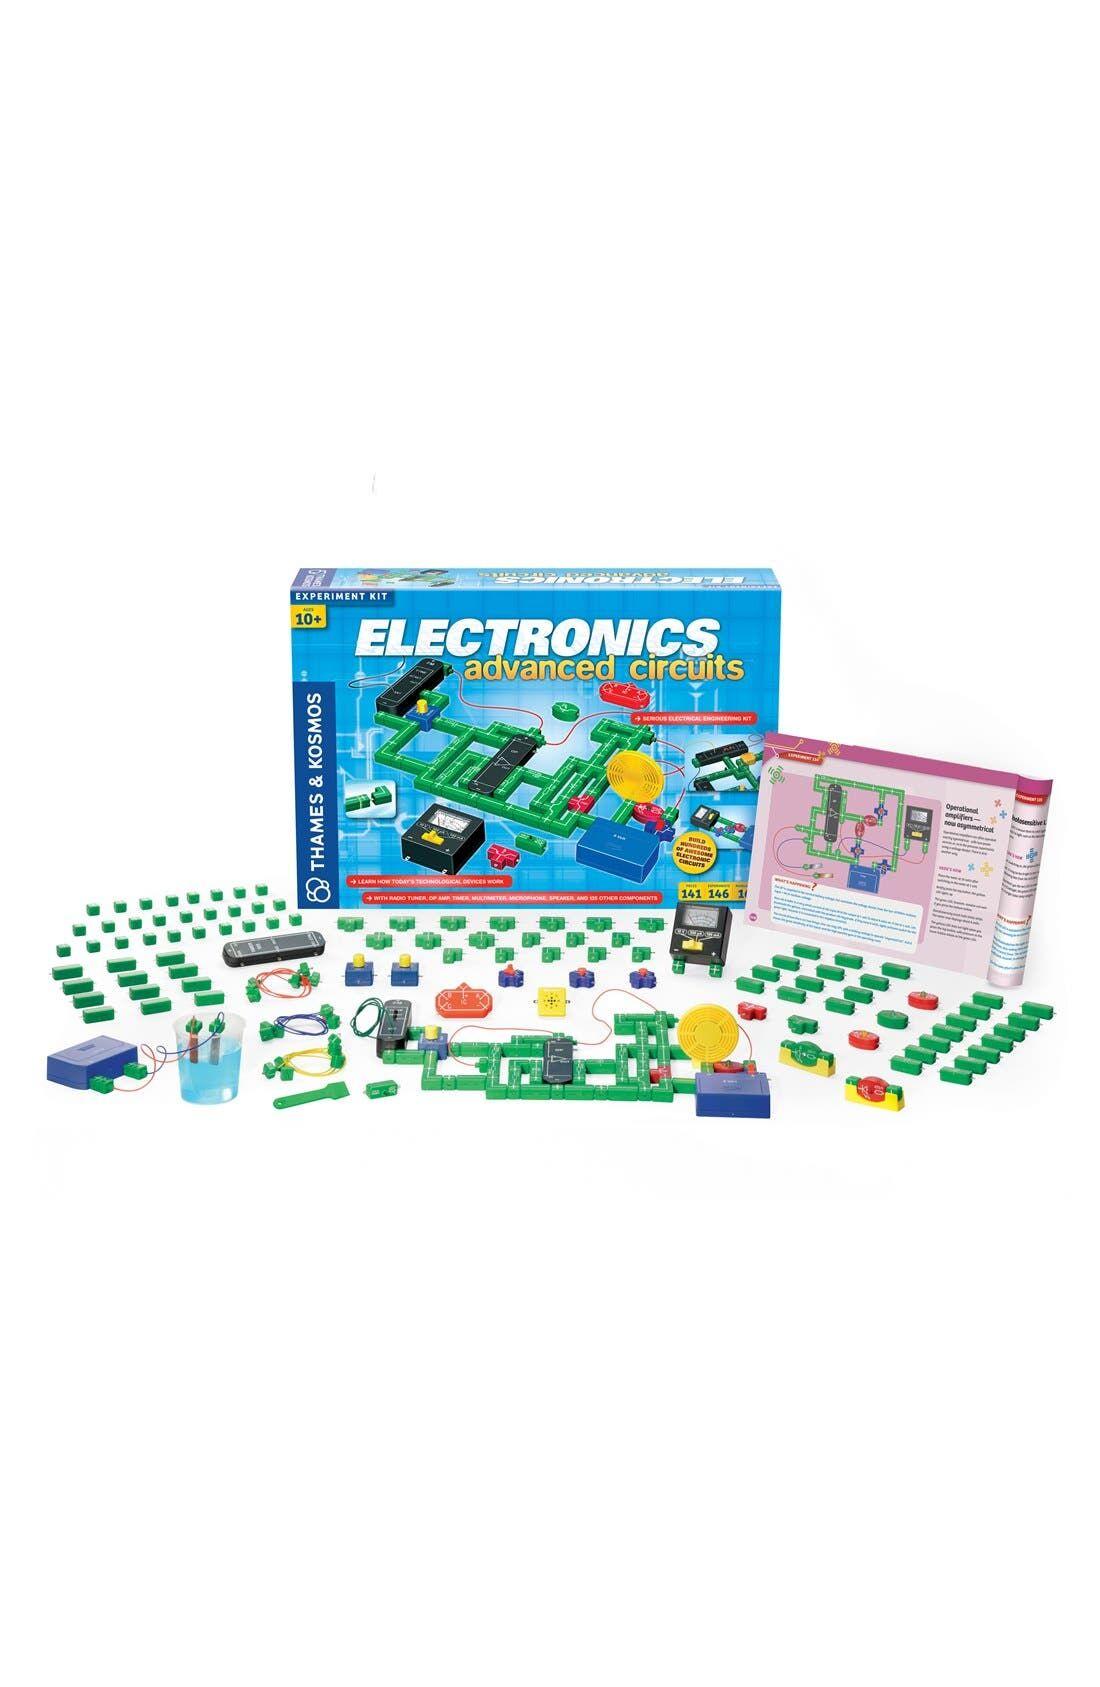 Thames & Kosmos Boy's Thames & Kosmos 'Electronics Advanced Circuits' Experiment Kit